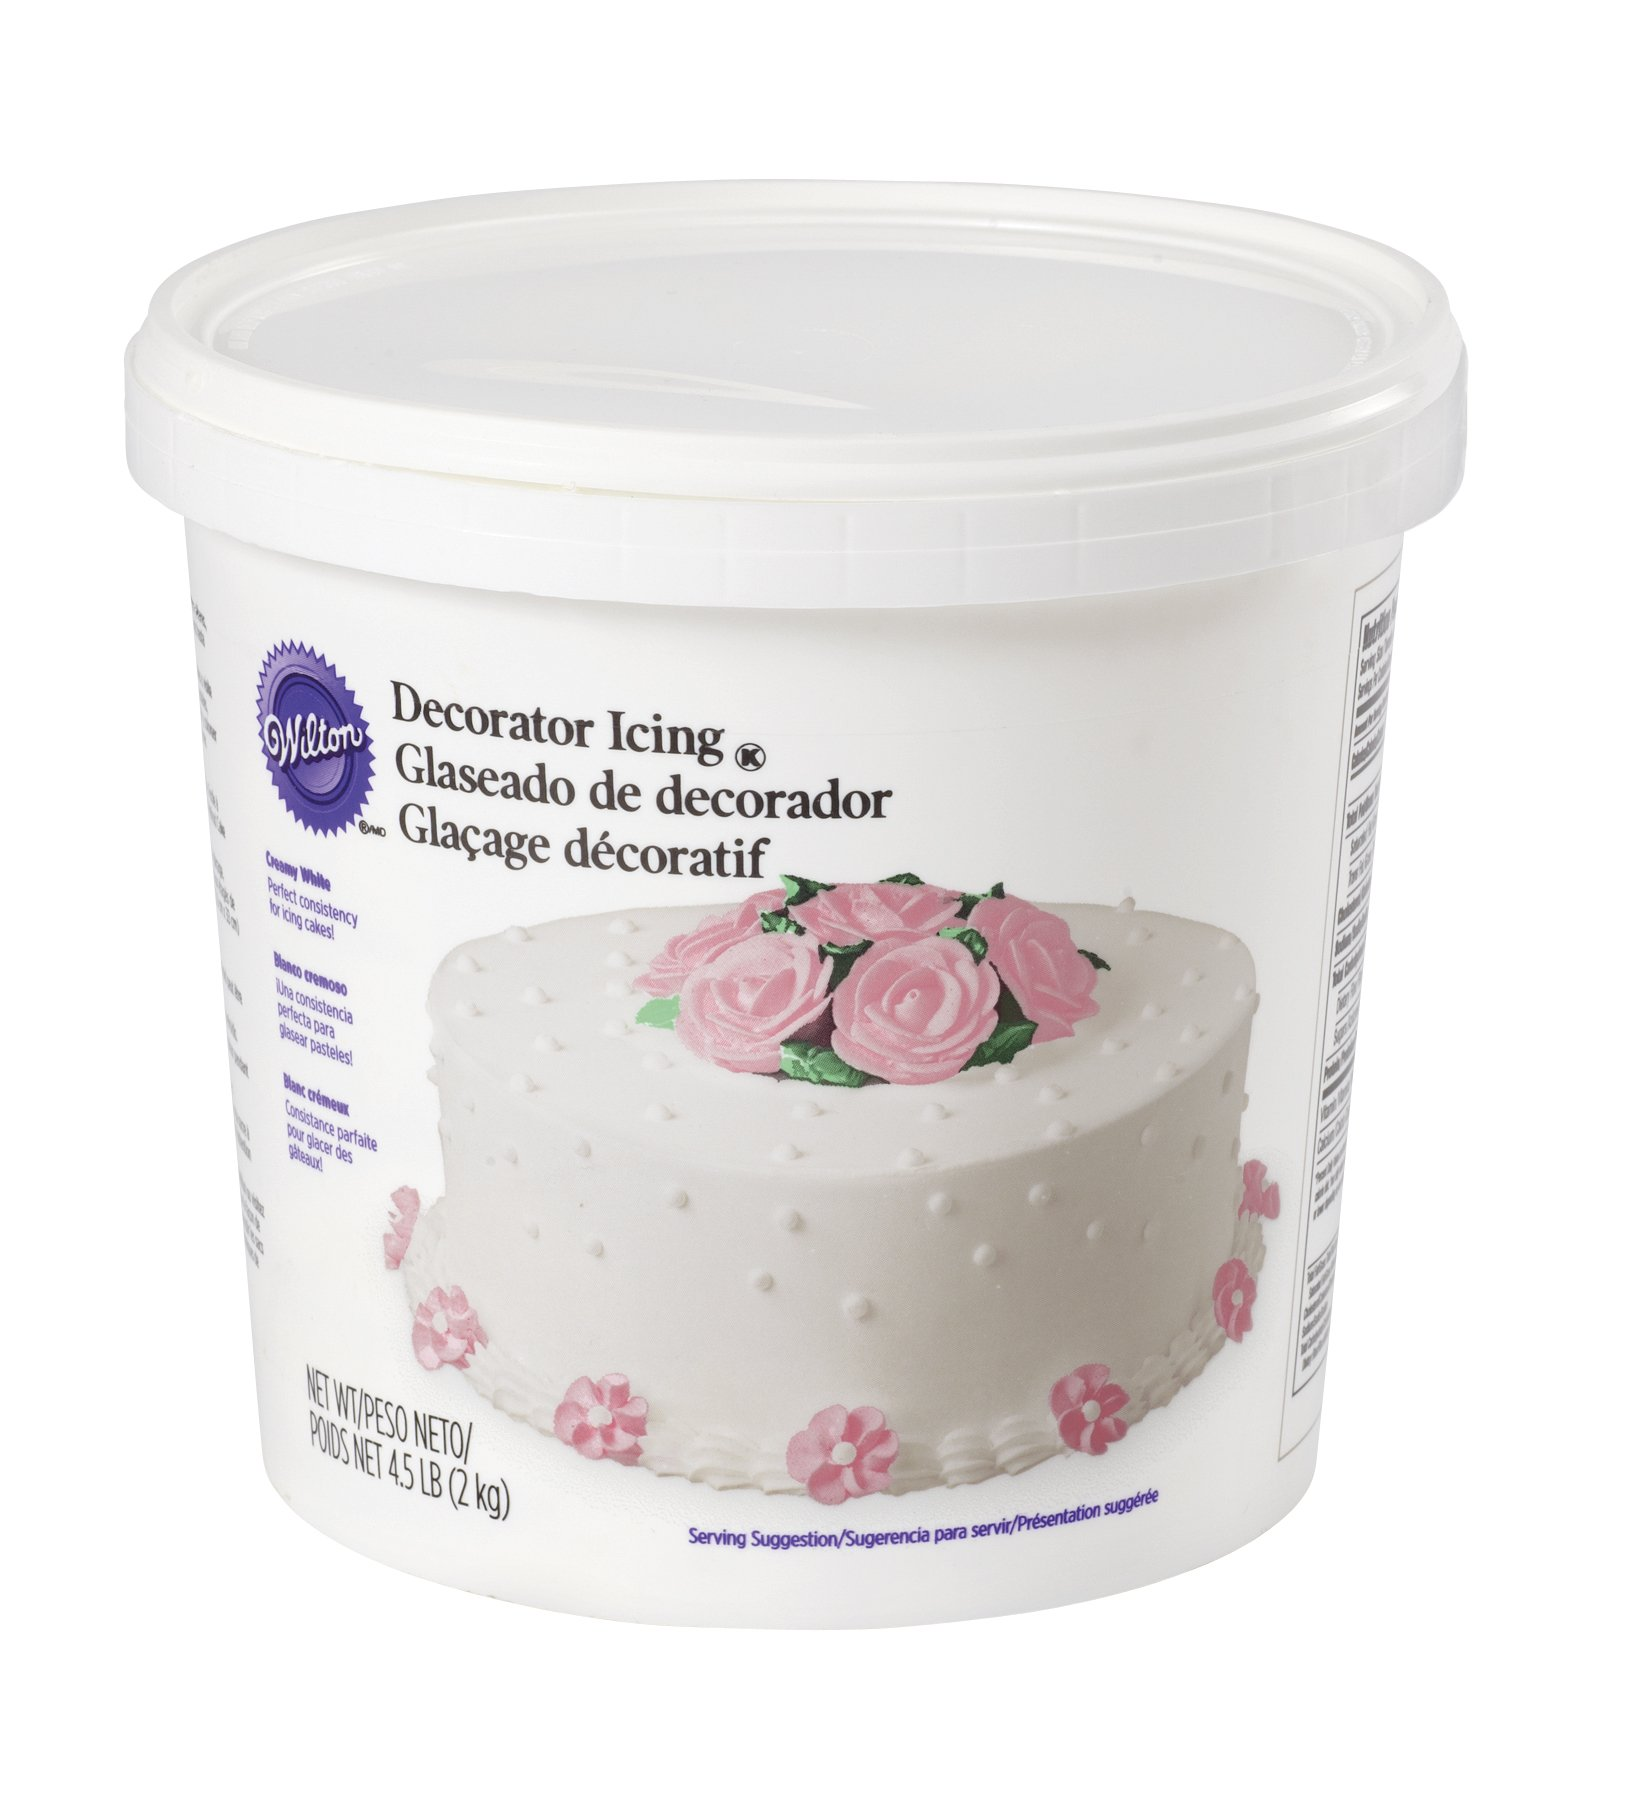 Wilton Creamy White Decorating Icing, 4.5 lb. Tub - White Buttercream Icing